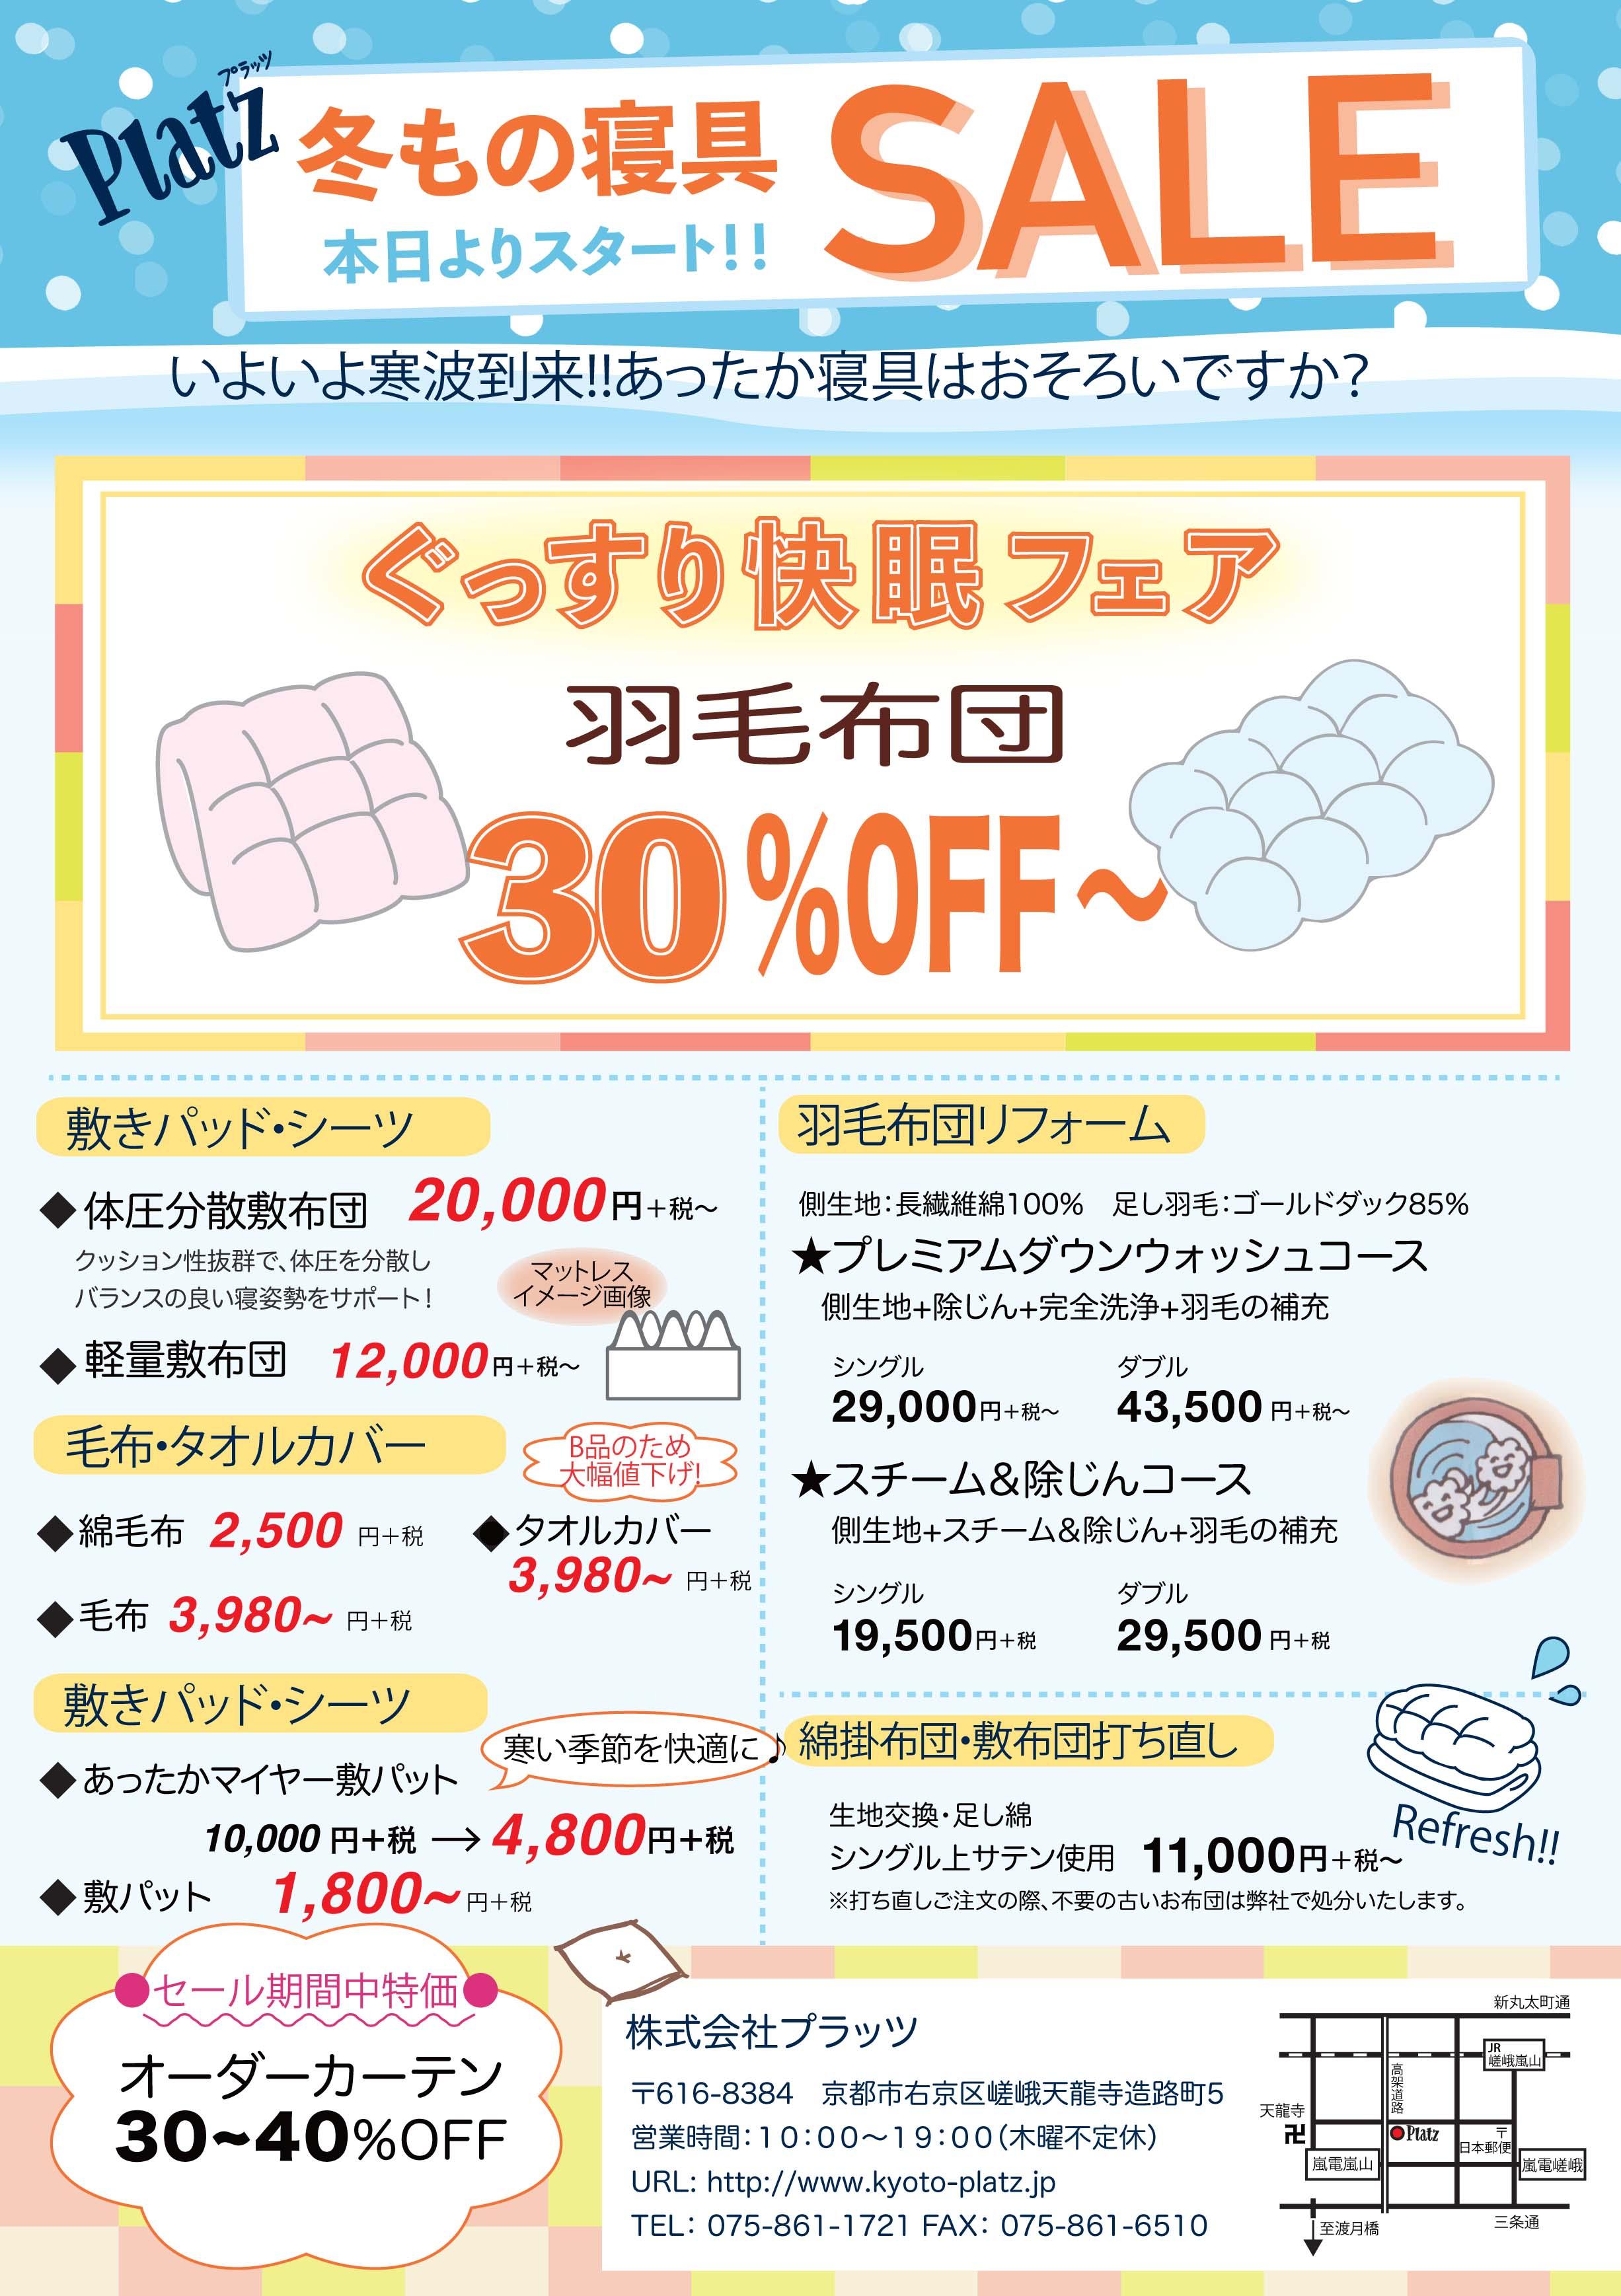 http://www.kyoto-platz.jp/news/images/%E3%81%A1%E3%82%89%E3%81%97%E6%8E%B2%E8%BC%89%E3%83%87%E3%83%BC%E3%82%BF.jpg